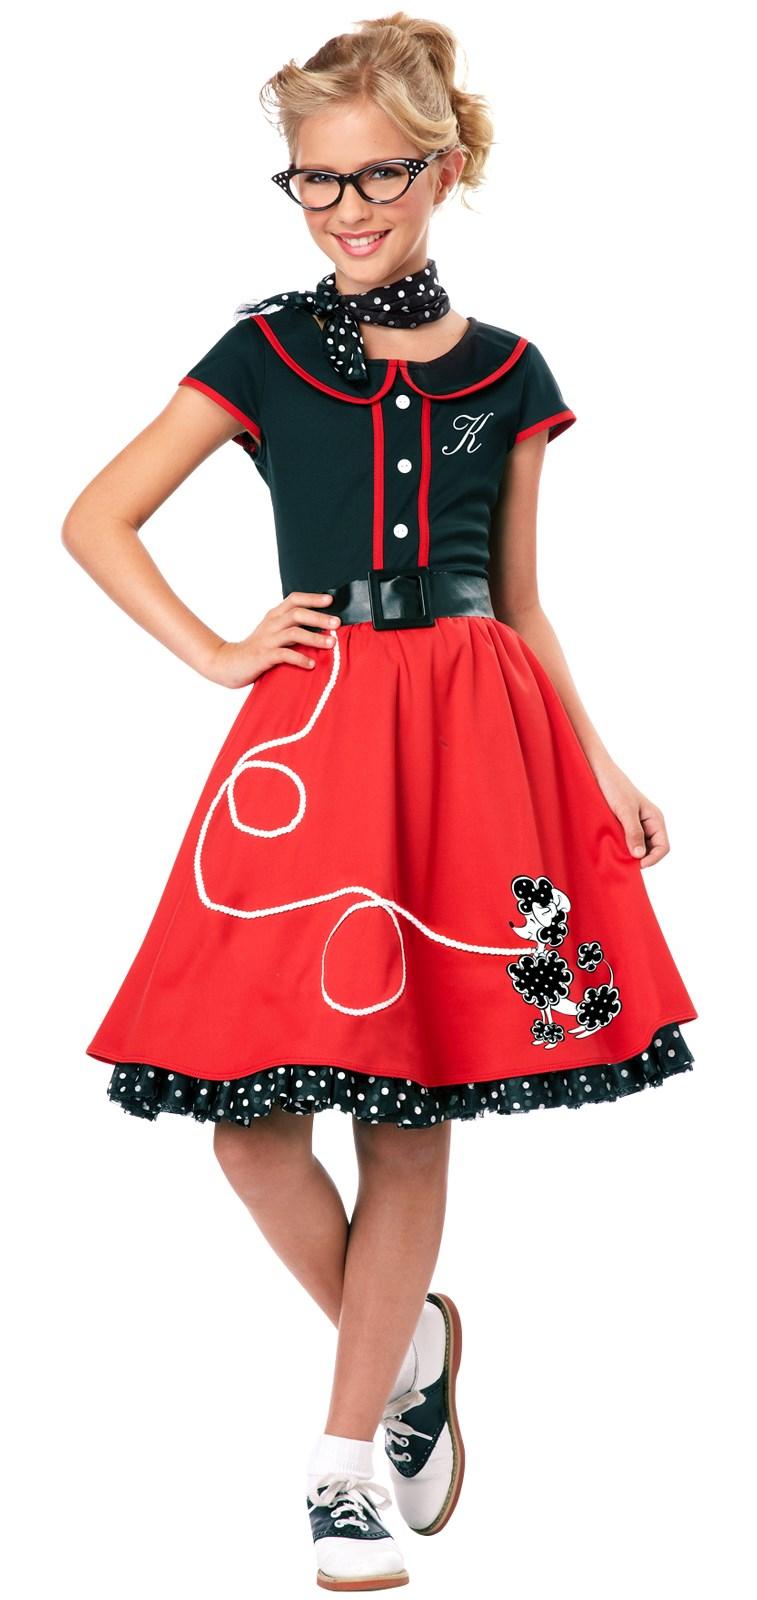 Image of 50's Sweetheart Child Costume Medium (8-10)